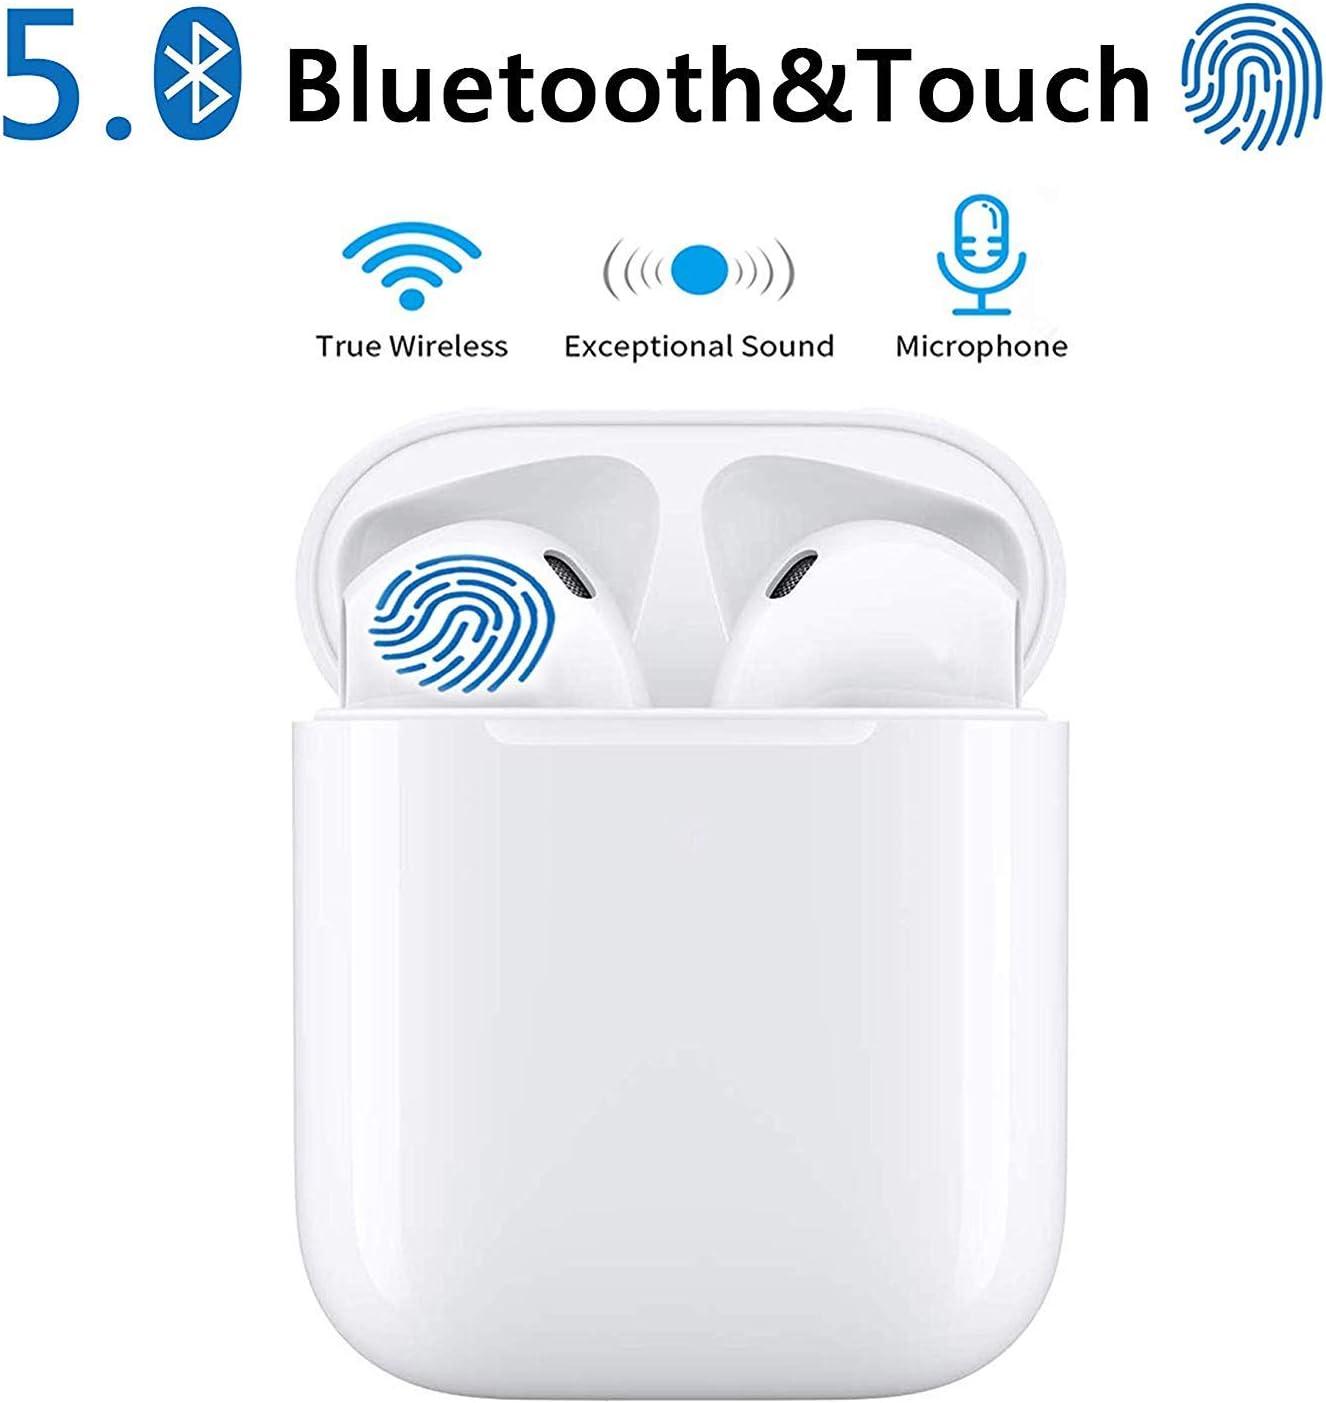 【Neueste】 Bluetooth 5.0 Kopfh/örer Kabellos Noise Cancelling In Ear Ohrh/örer mit 950mAh Batterie Sport IPX6 Wasserdicht Mikrofon f/ür Apple Airpod Android iPhone